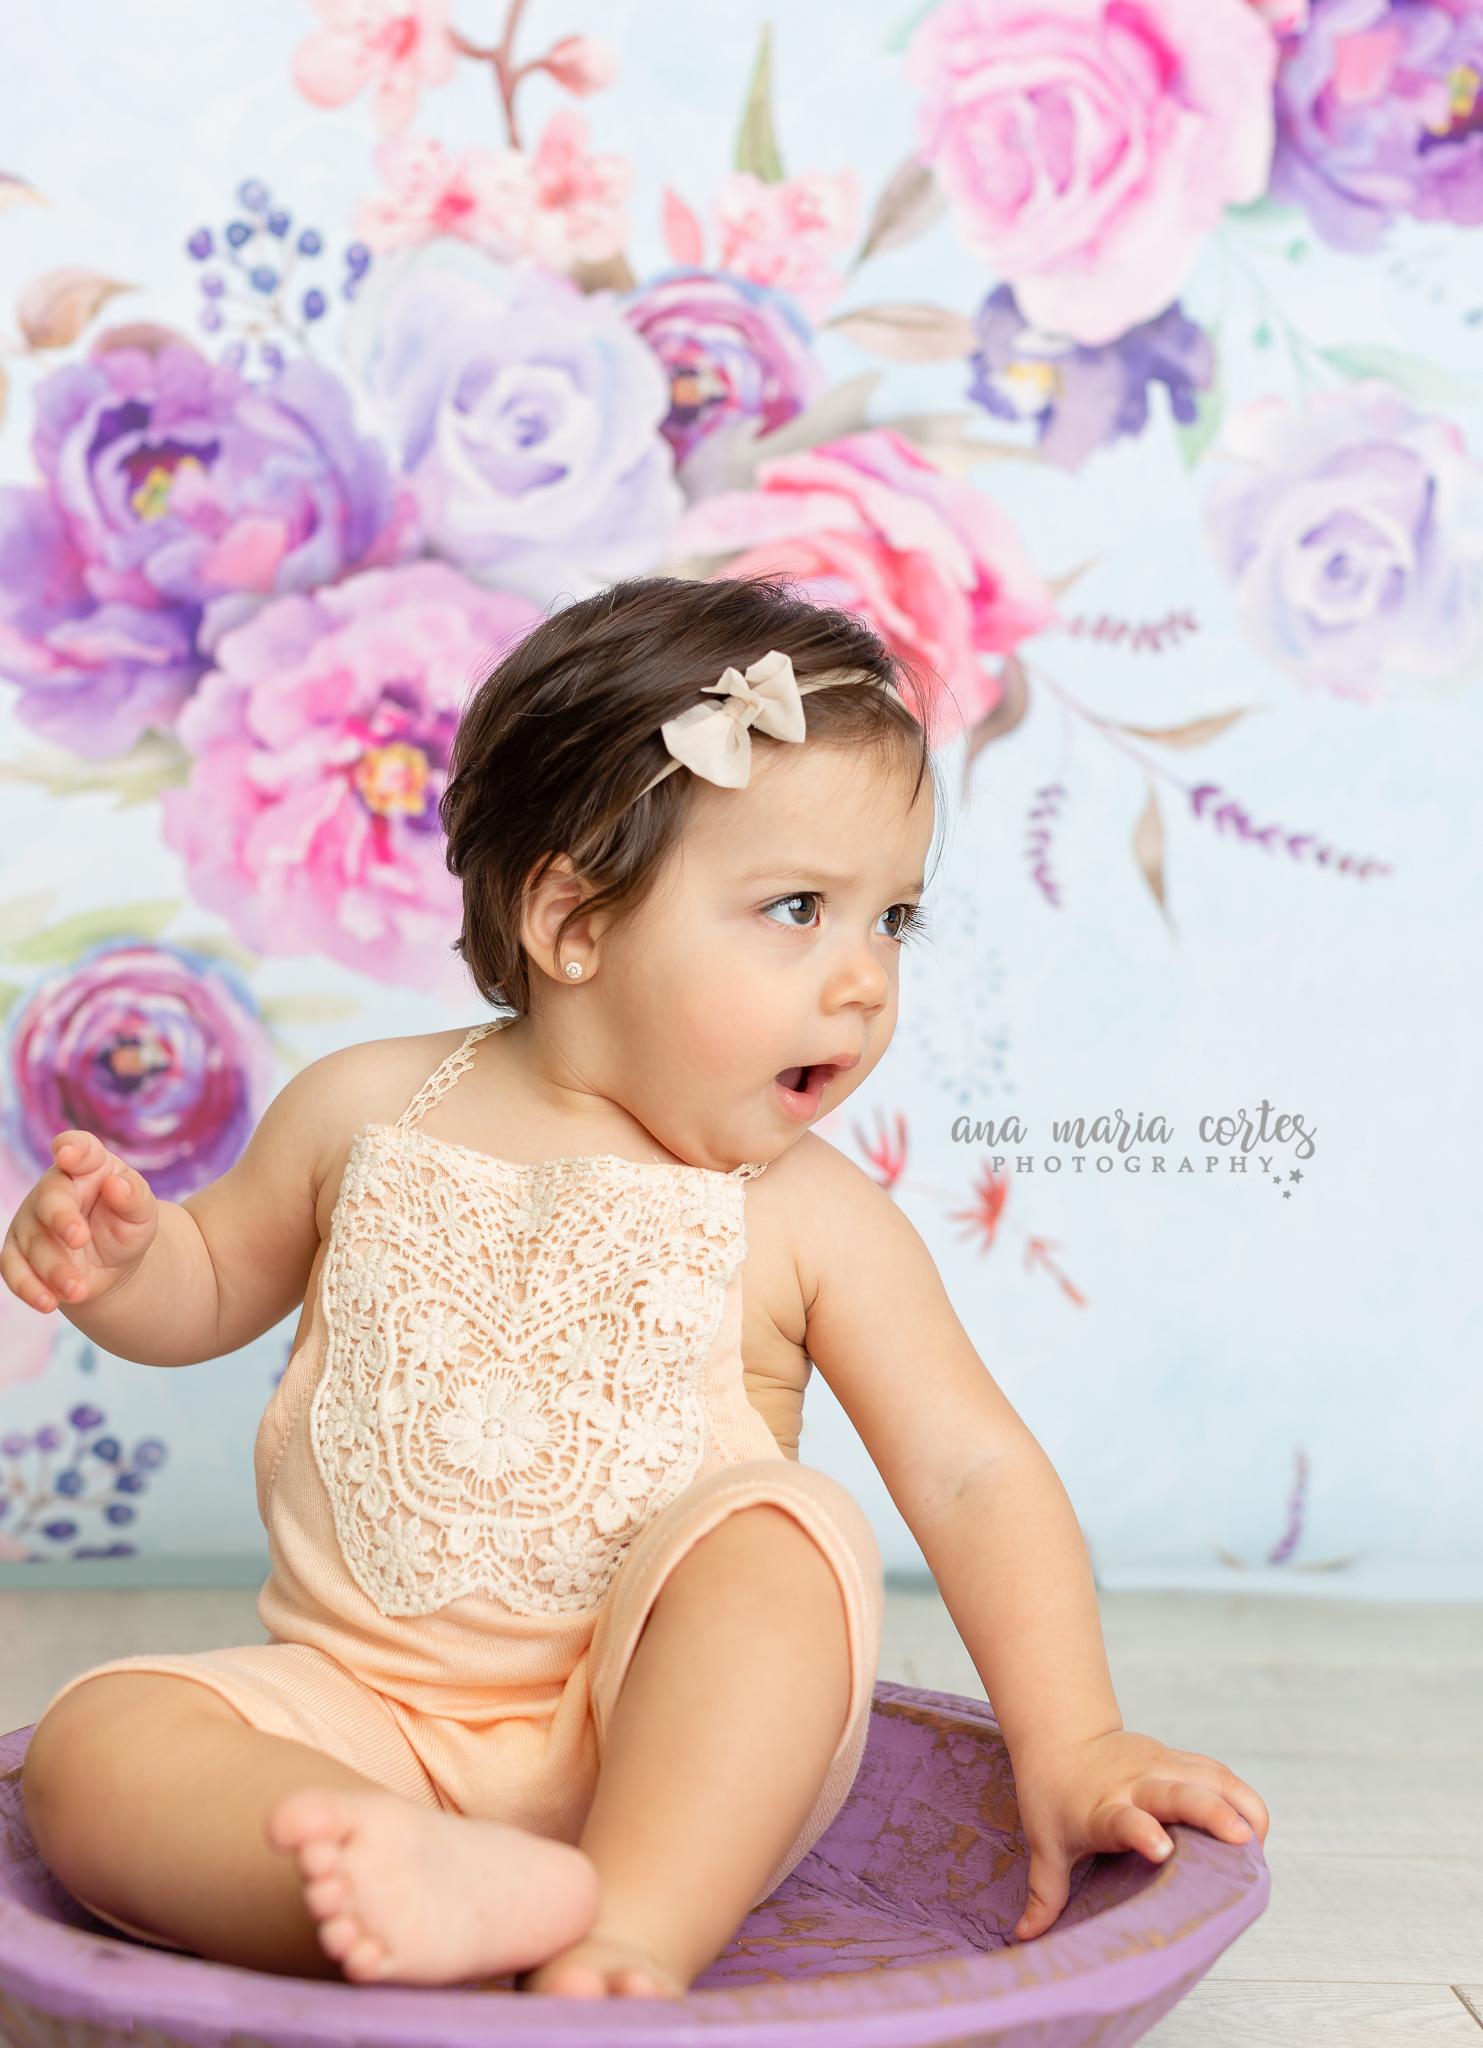 Ana Maria Cortes Photography Cake smash1